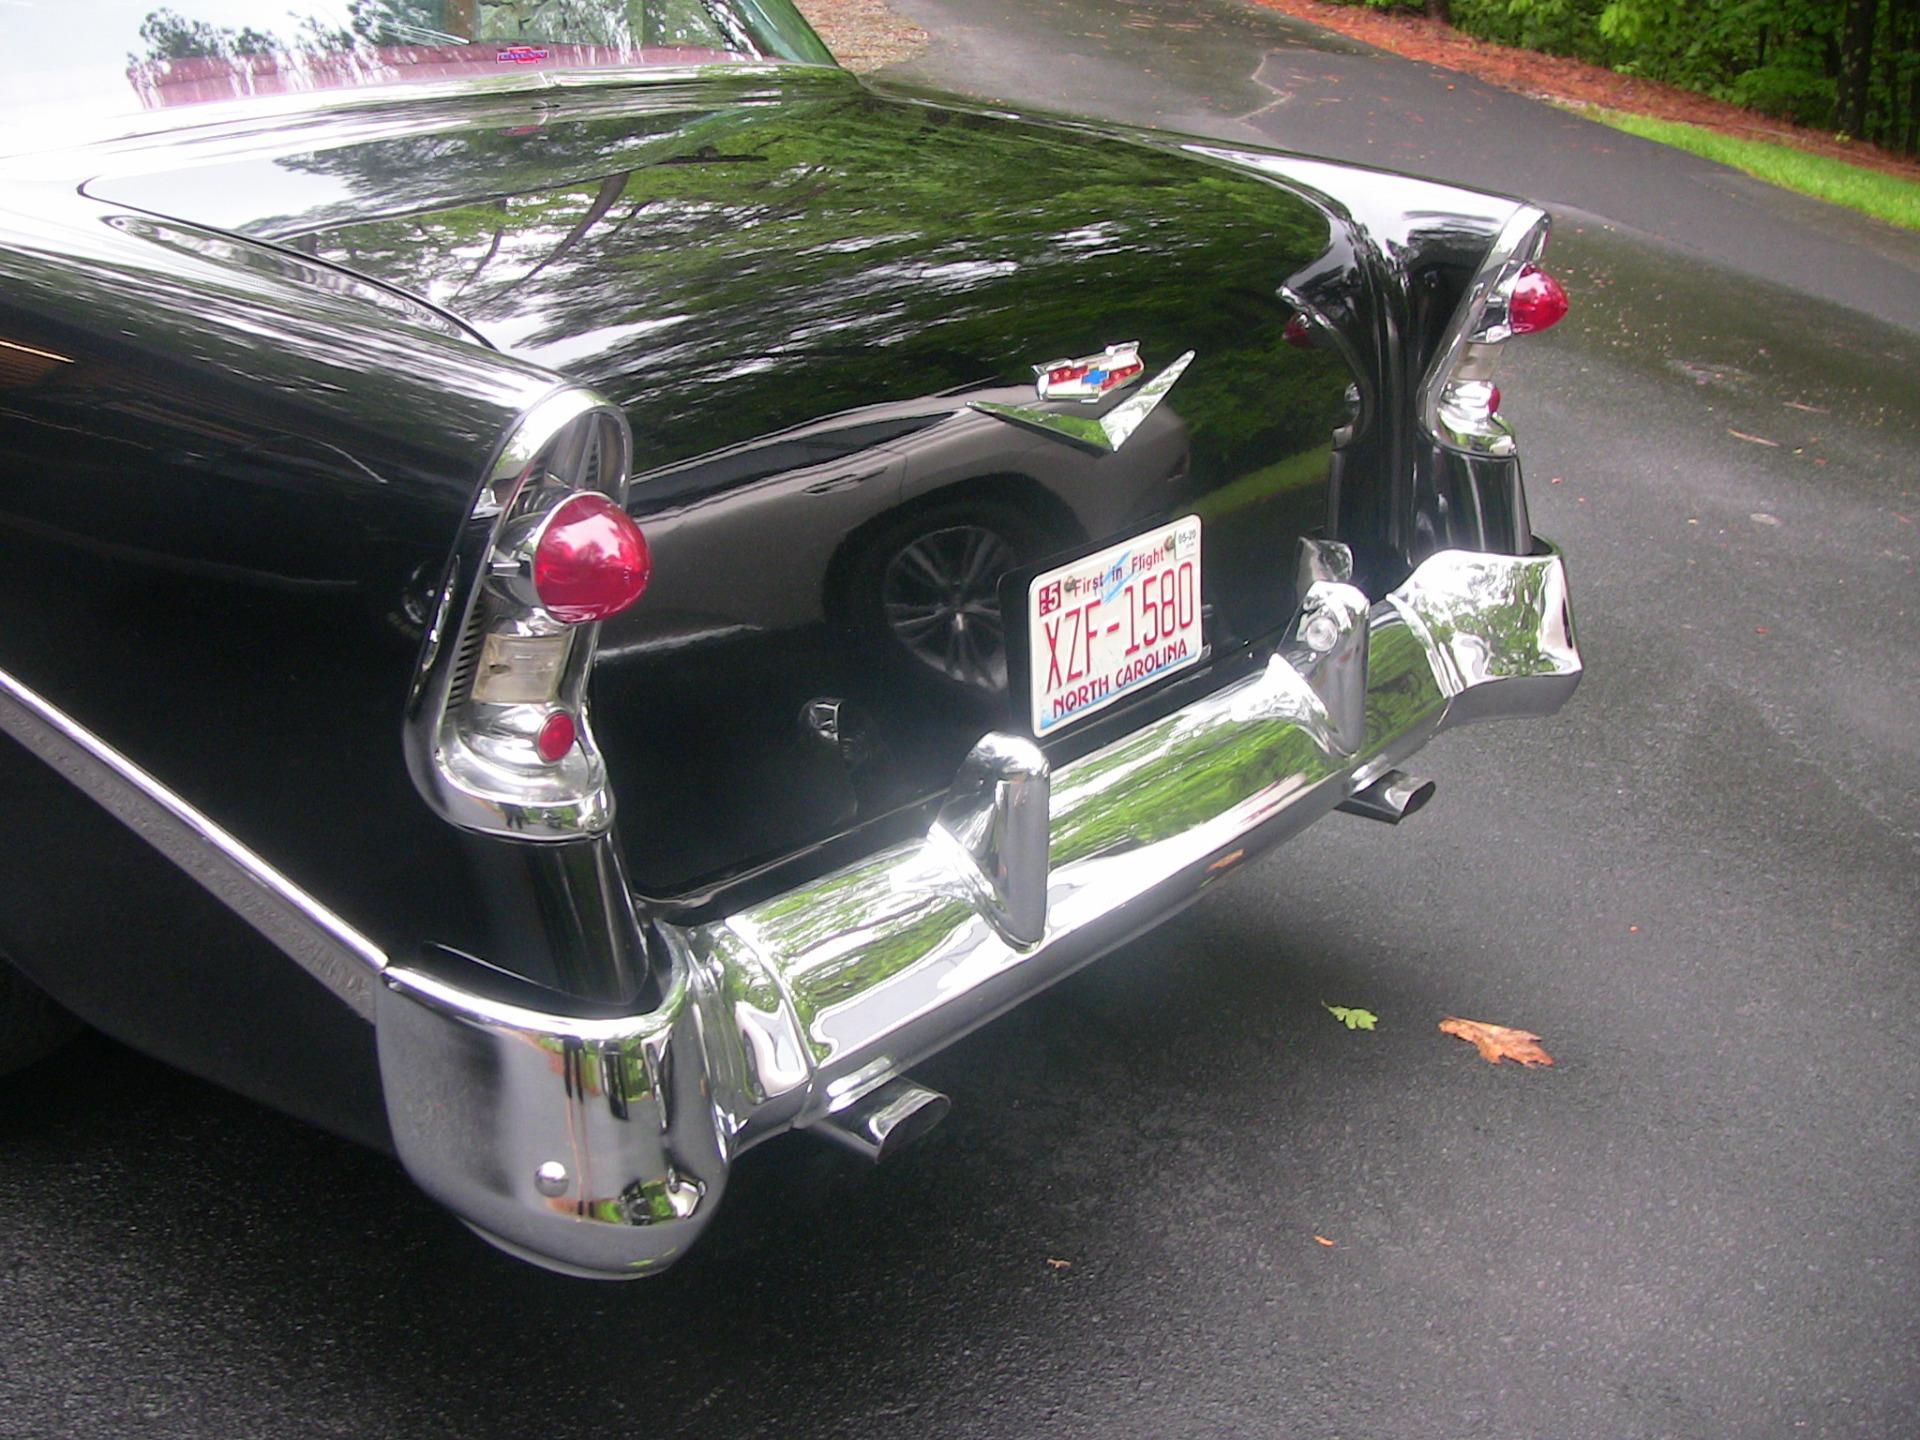 Used 1956 Chevrolet 210 Sedan